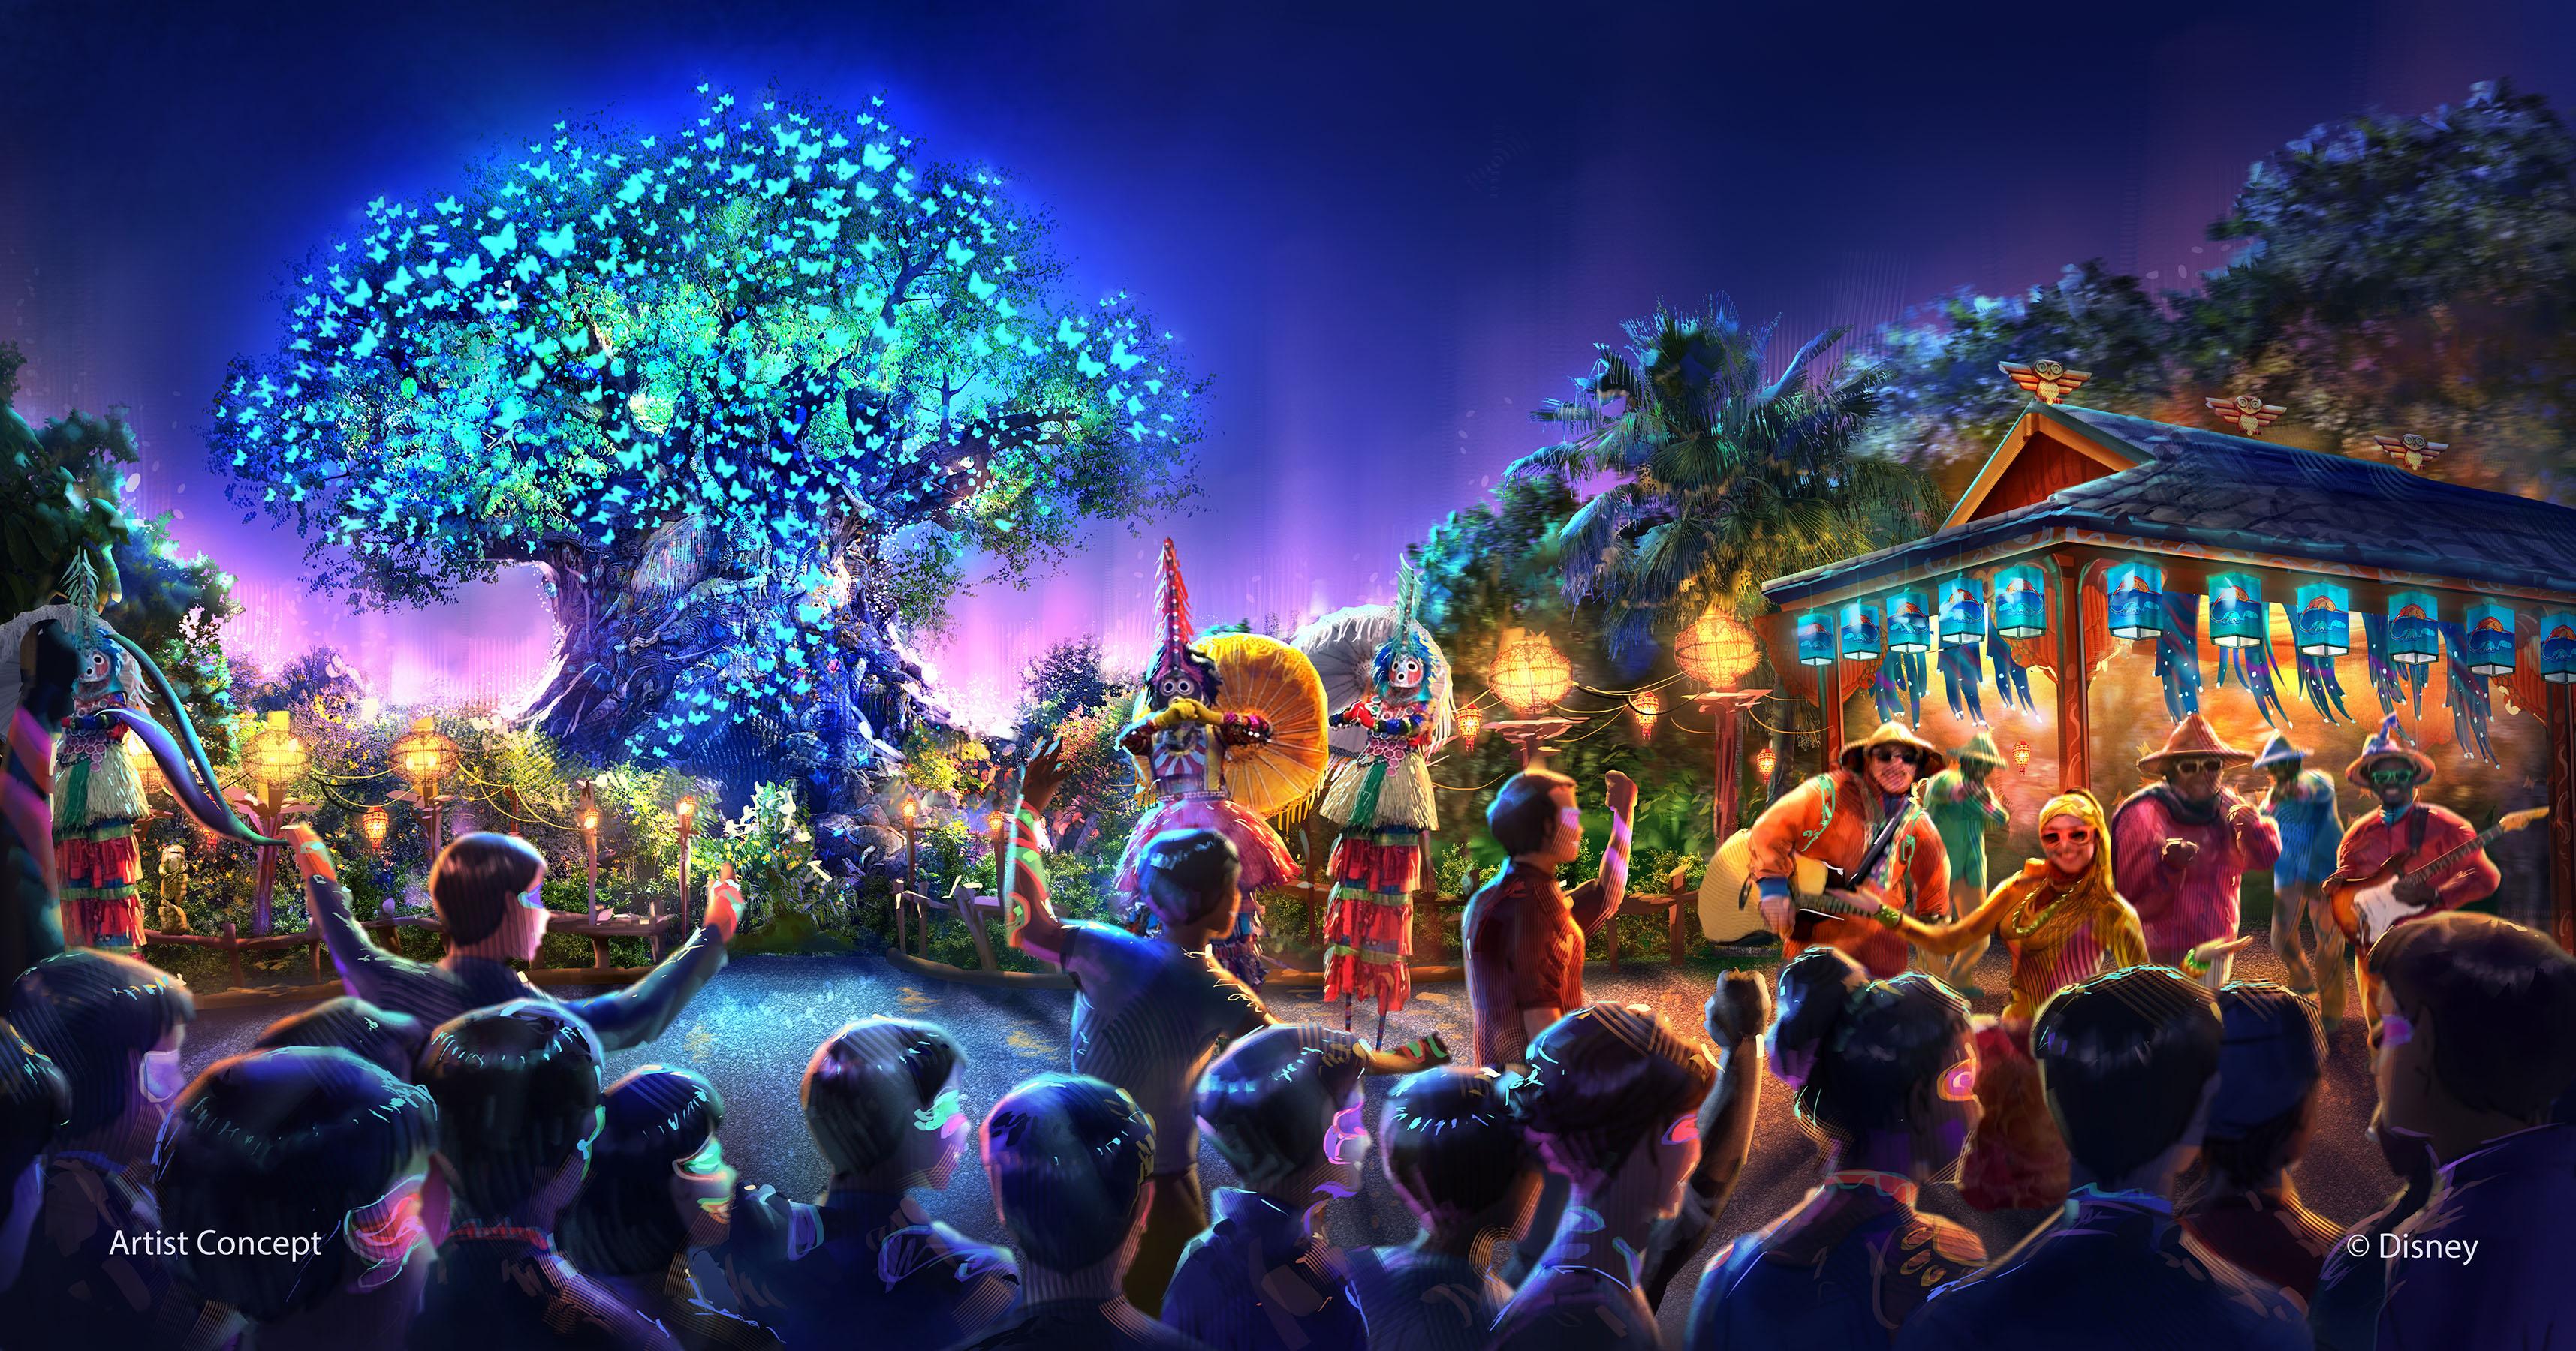 Nighttime entertainment at Disney's Animal Kingdom concept art